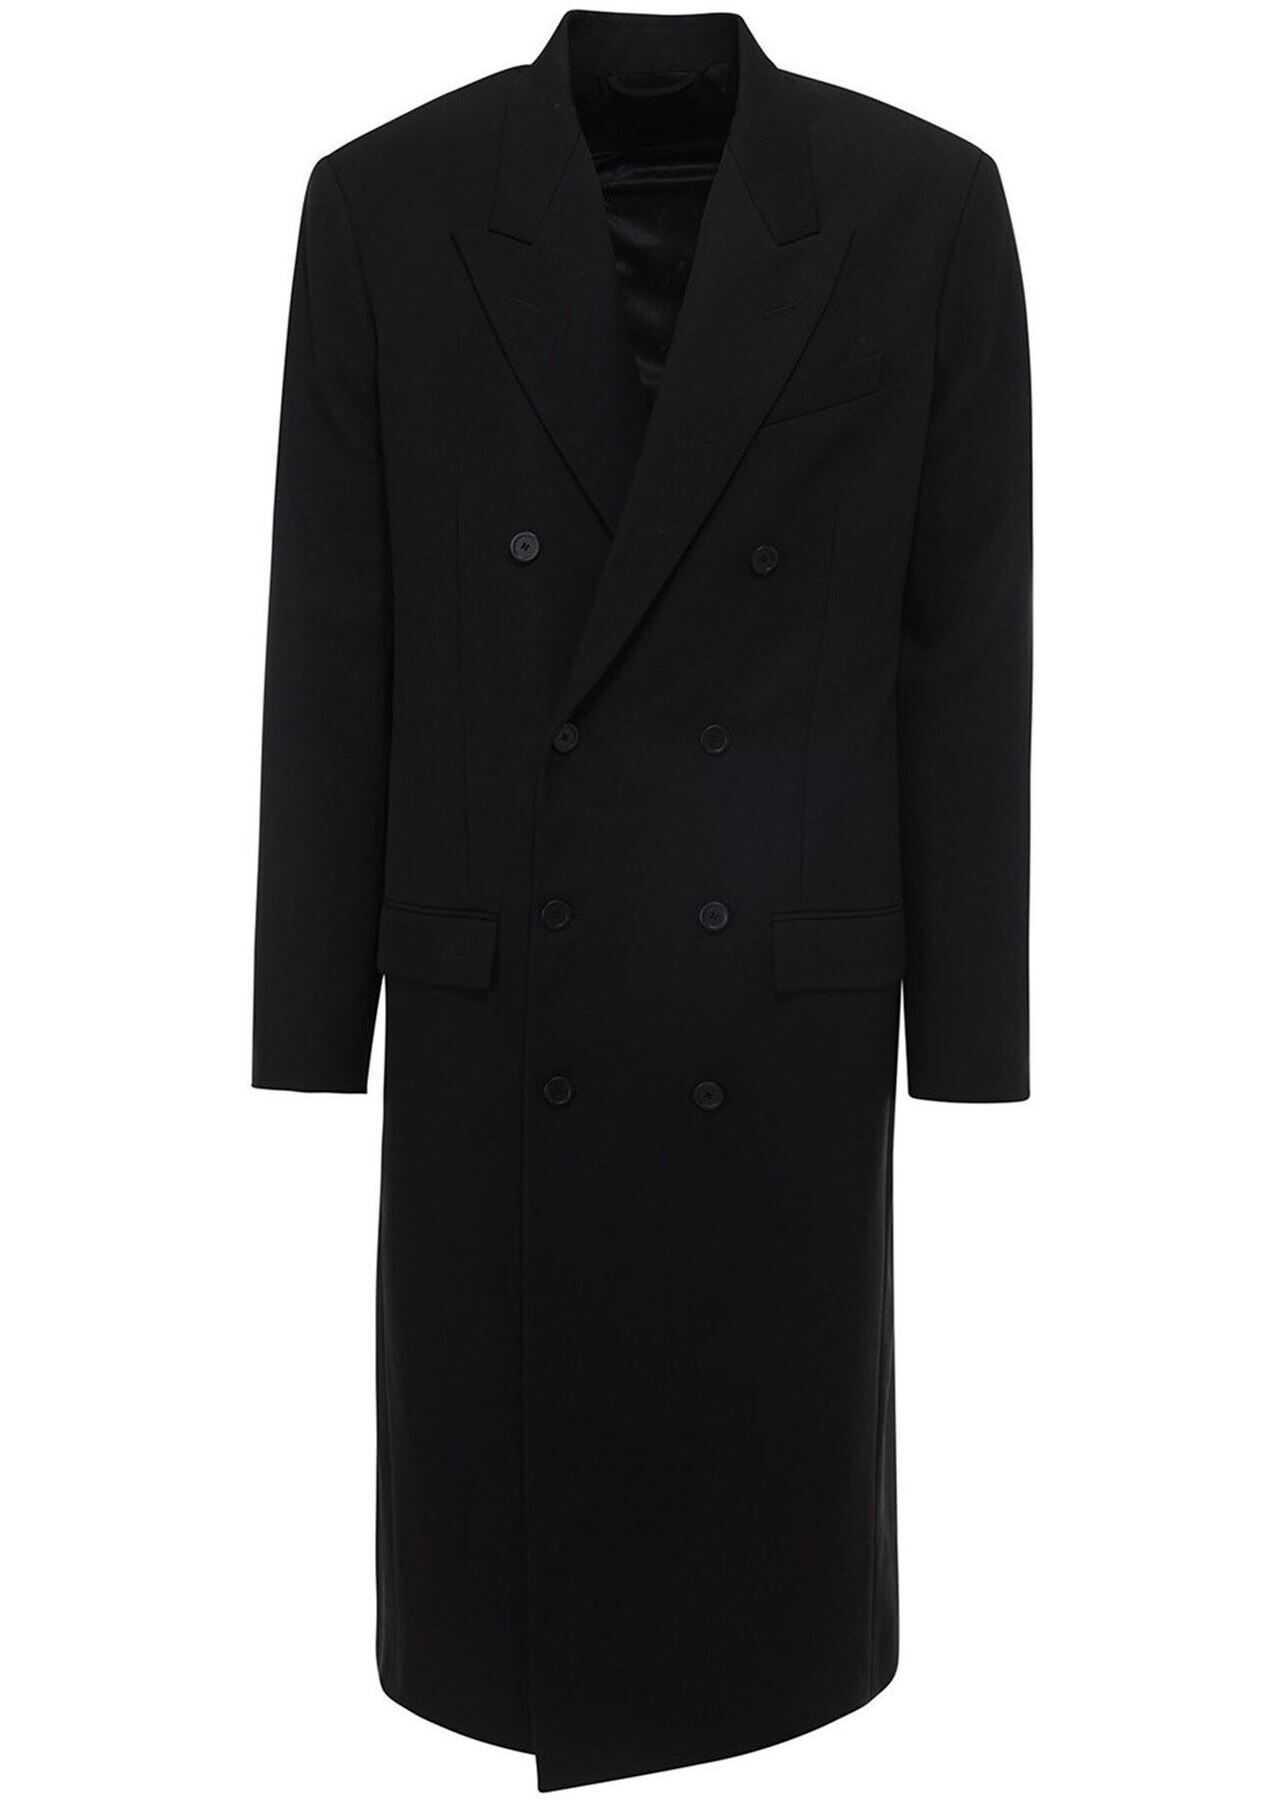 Balenciaga Double-Breasted Wool Coat In Black Black imagine